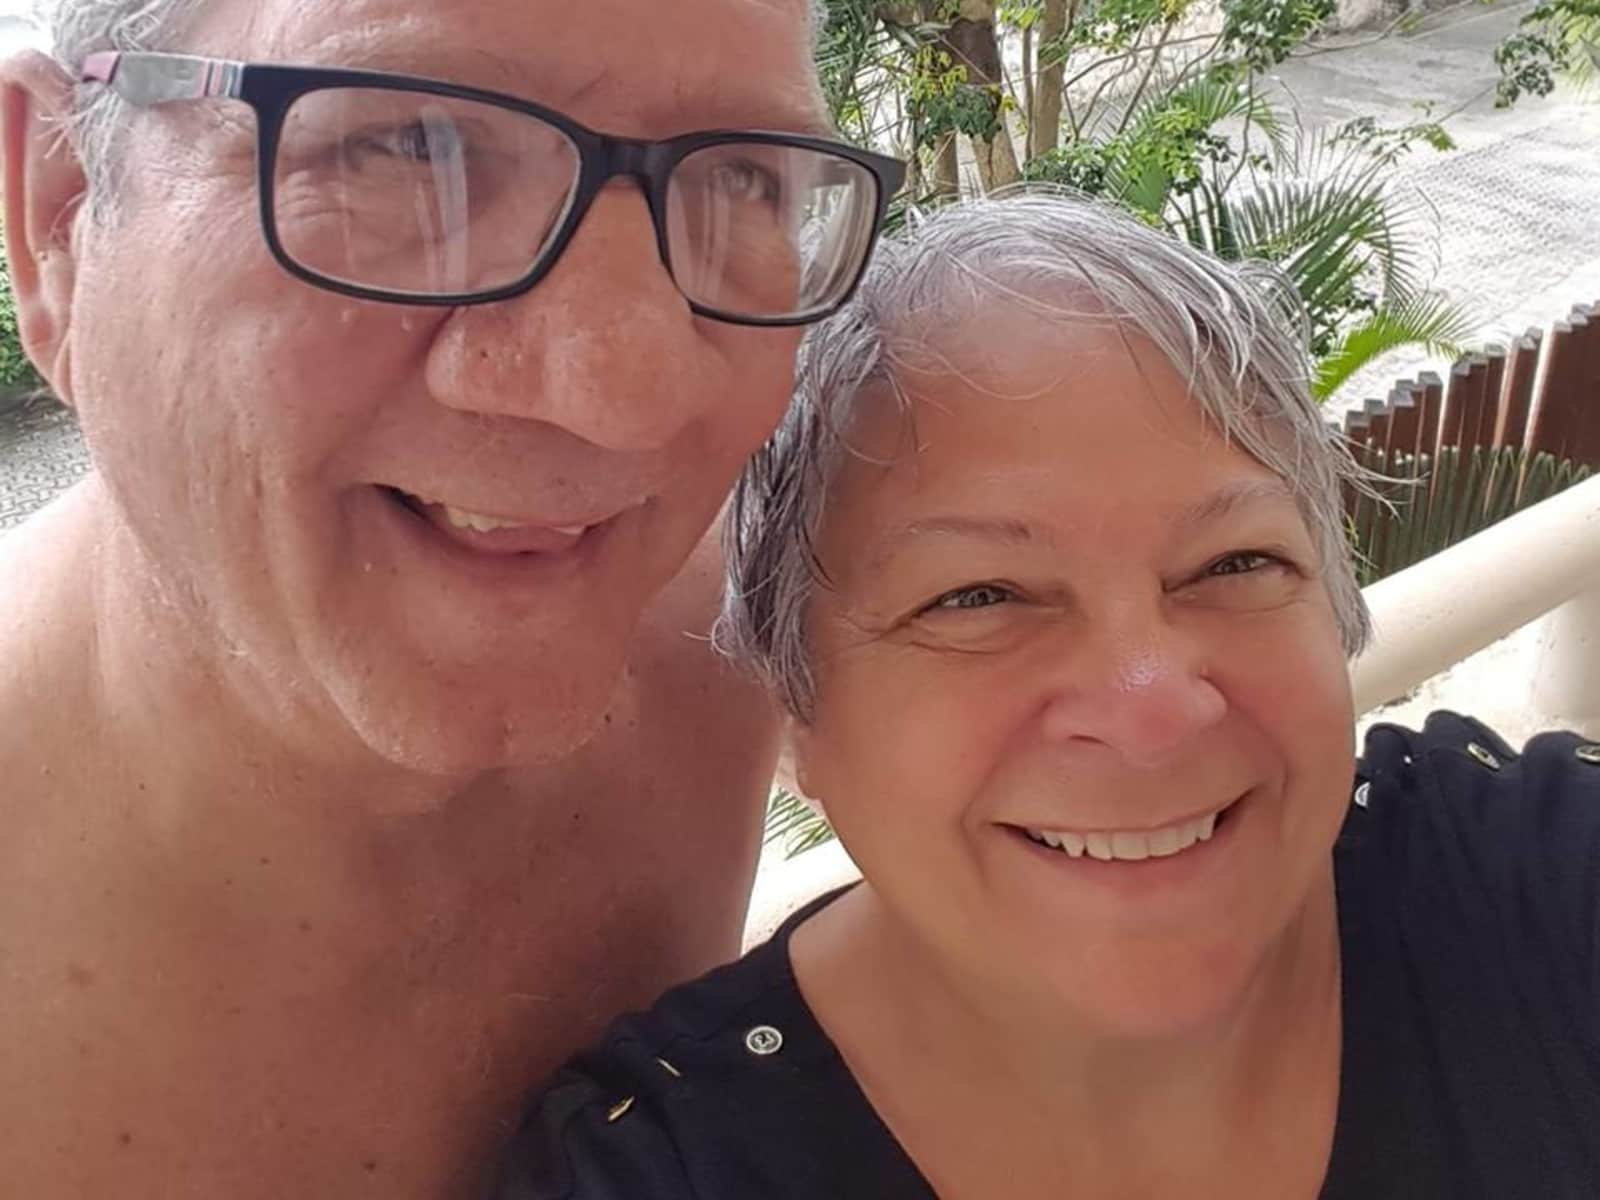 Joanne & Neil from Humboldt, Saskatchewan, Canada